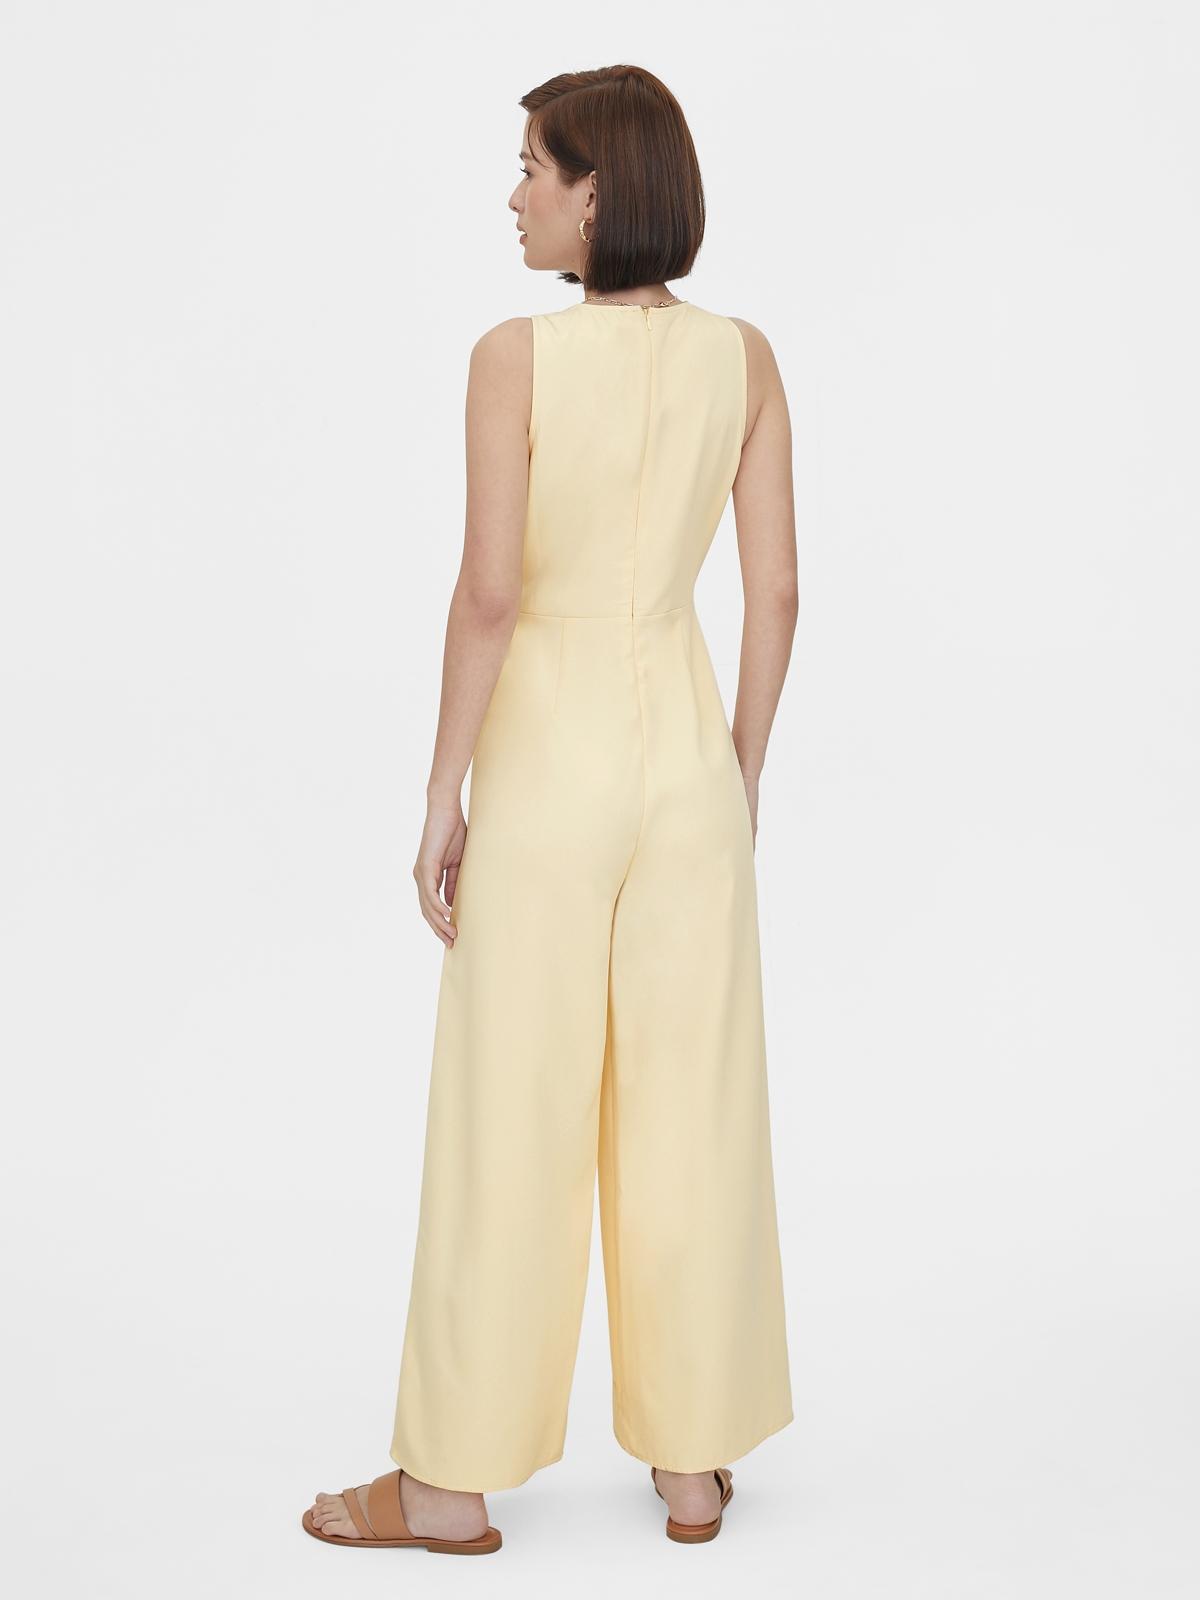 Buckle Belted Sleeveless Jumpsuit Cream